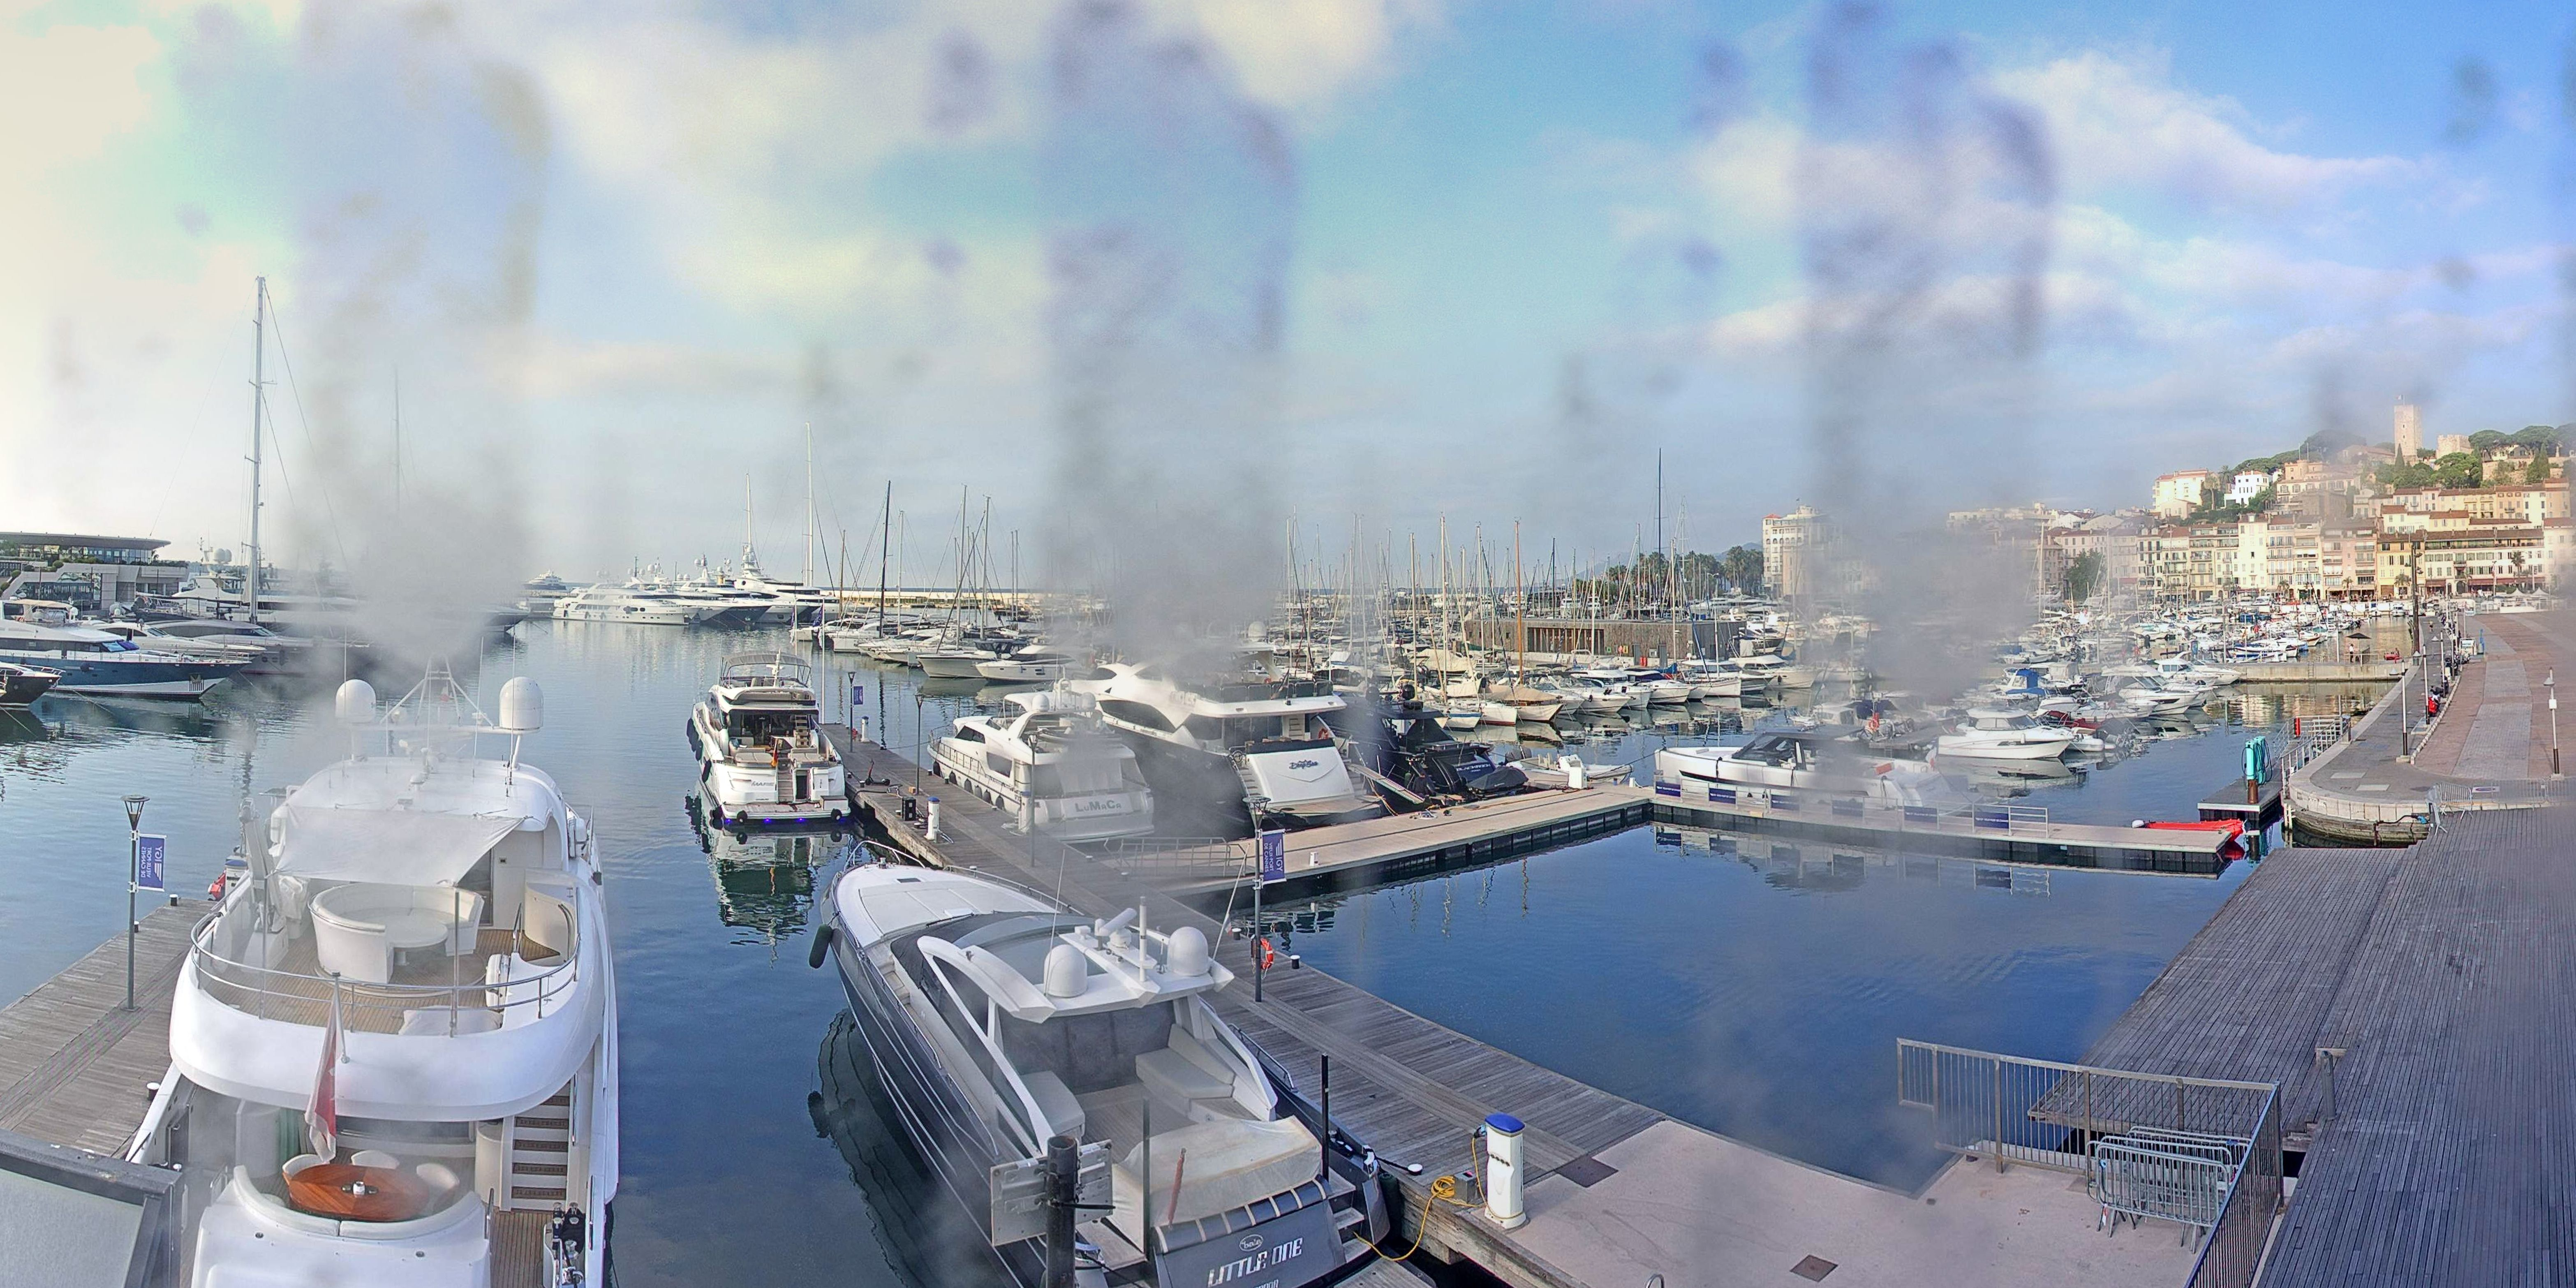 Cannes Thu. 09:35